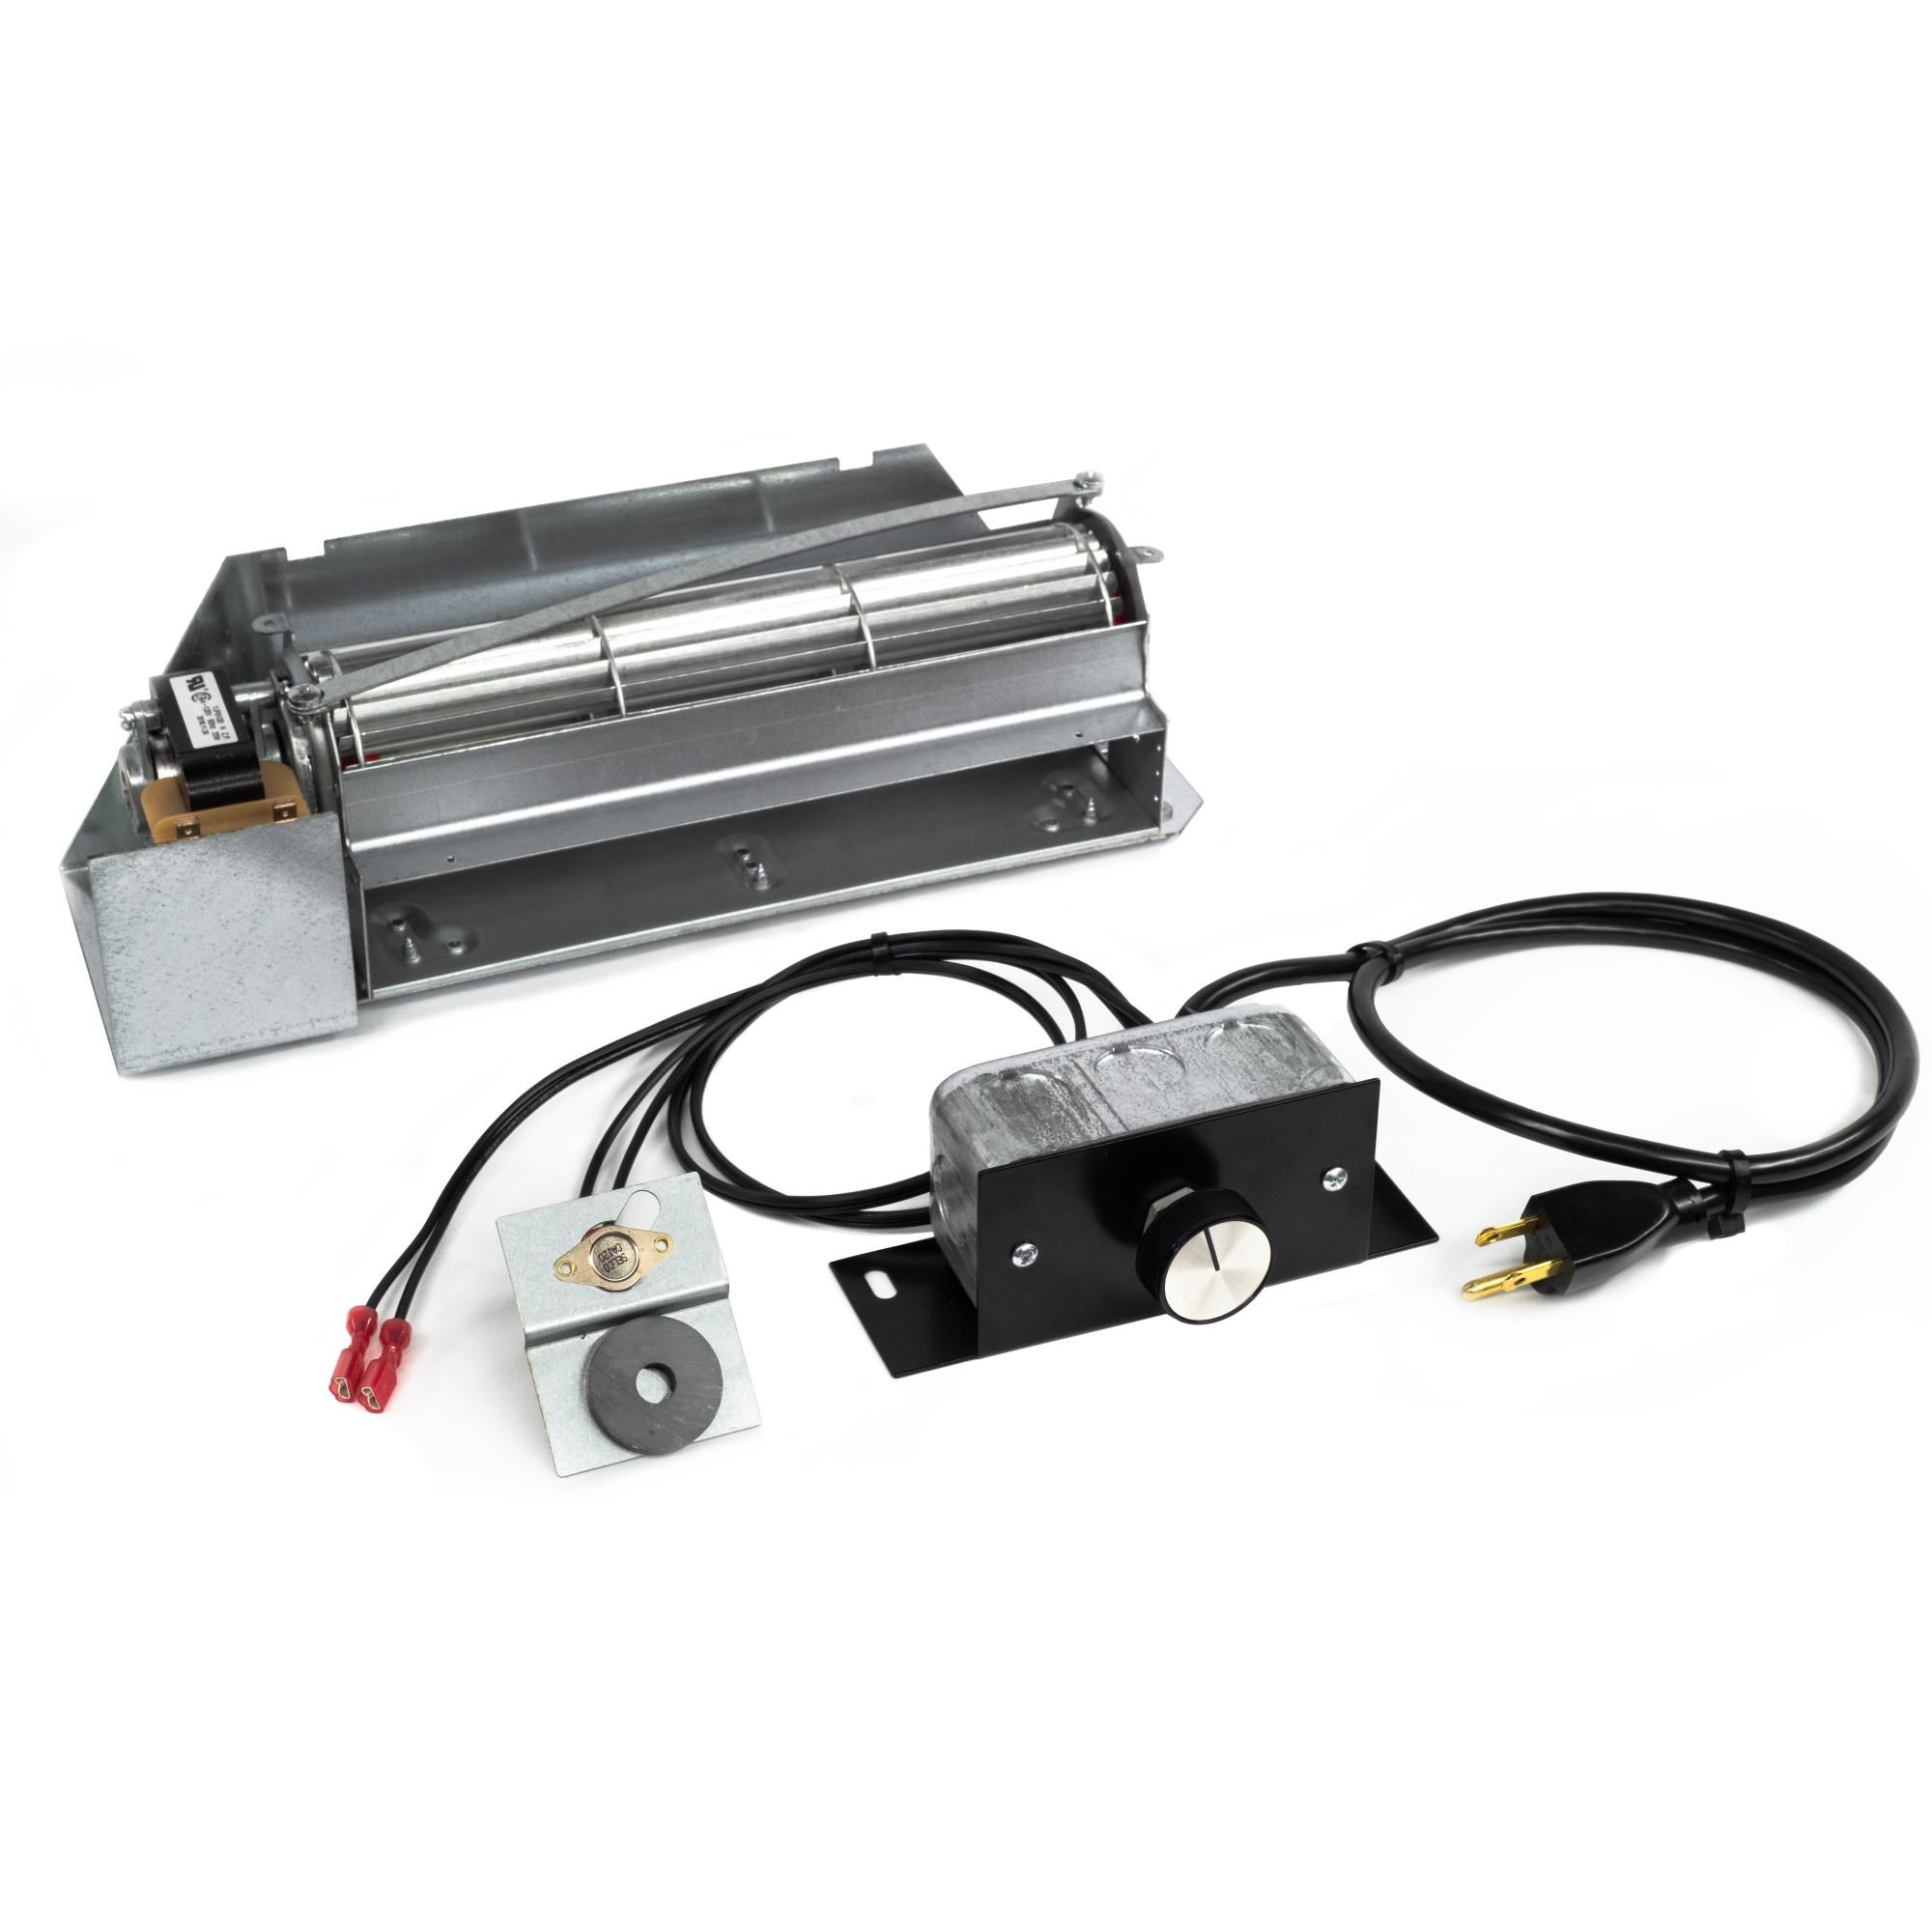 FBK-250 Blower Fan Conversion Kit for Astria, Lennox & Superior Fireplaces